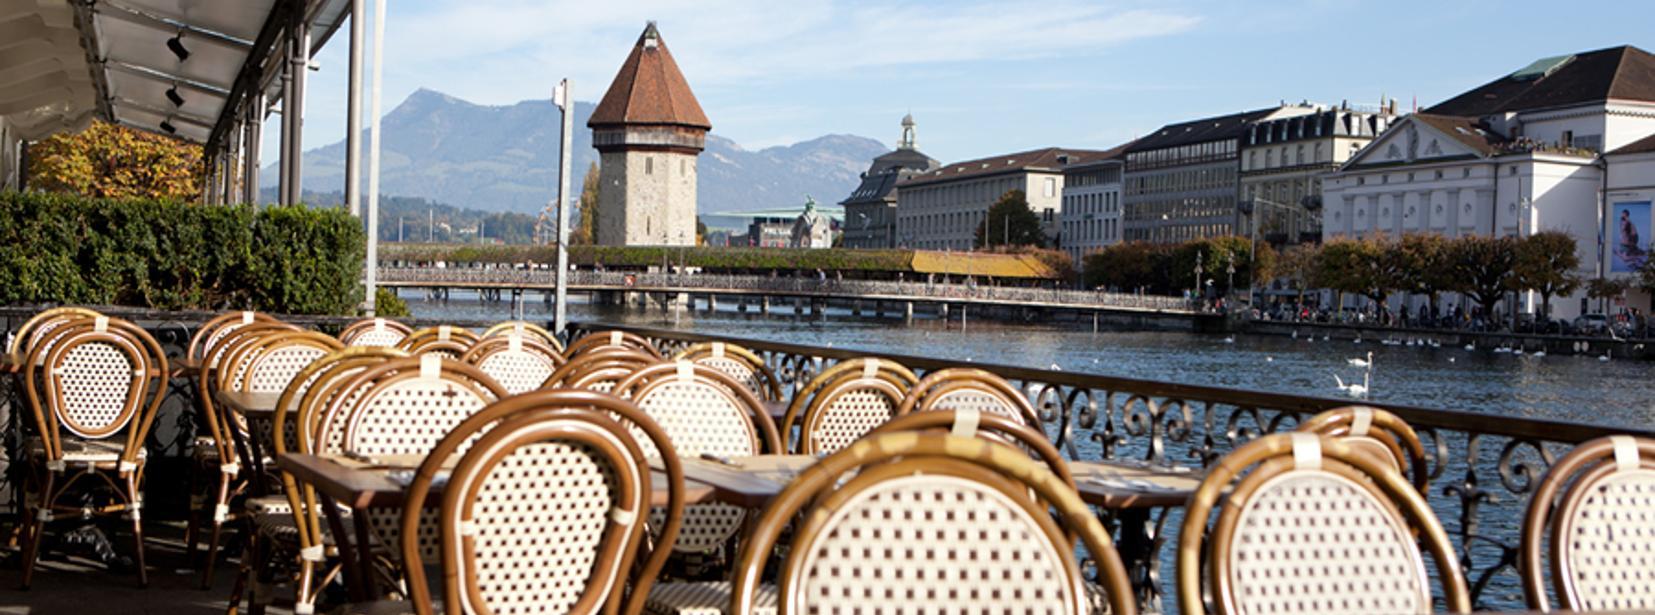 Ristorante La Terrazza | Lucerne | MyCityHighlight